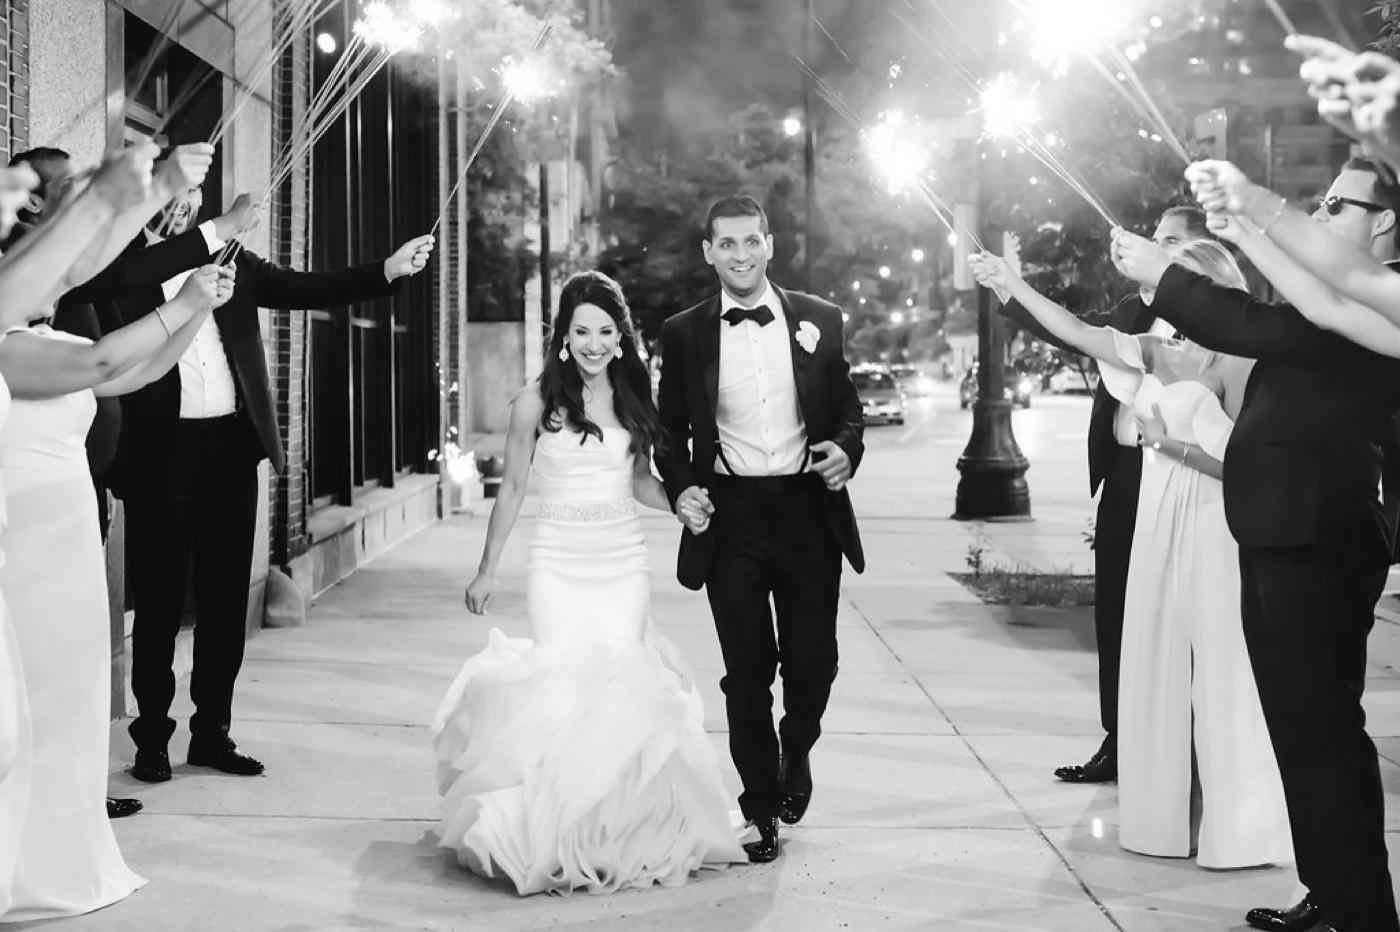 chicago-fine-art-wedding-photography-sakamuri95